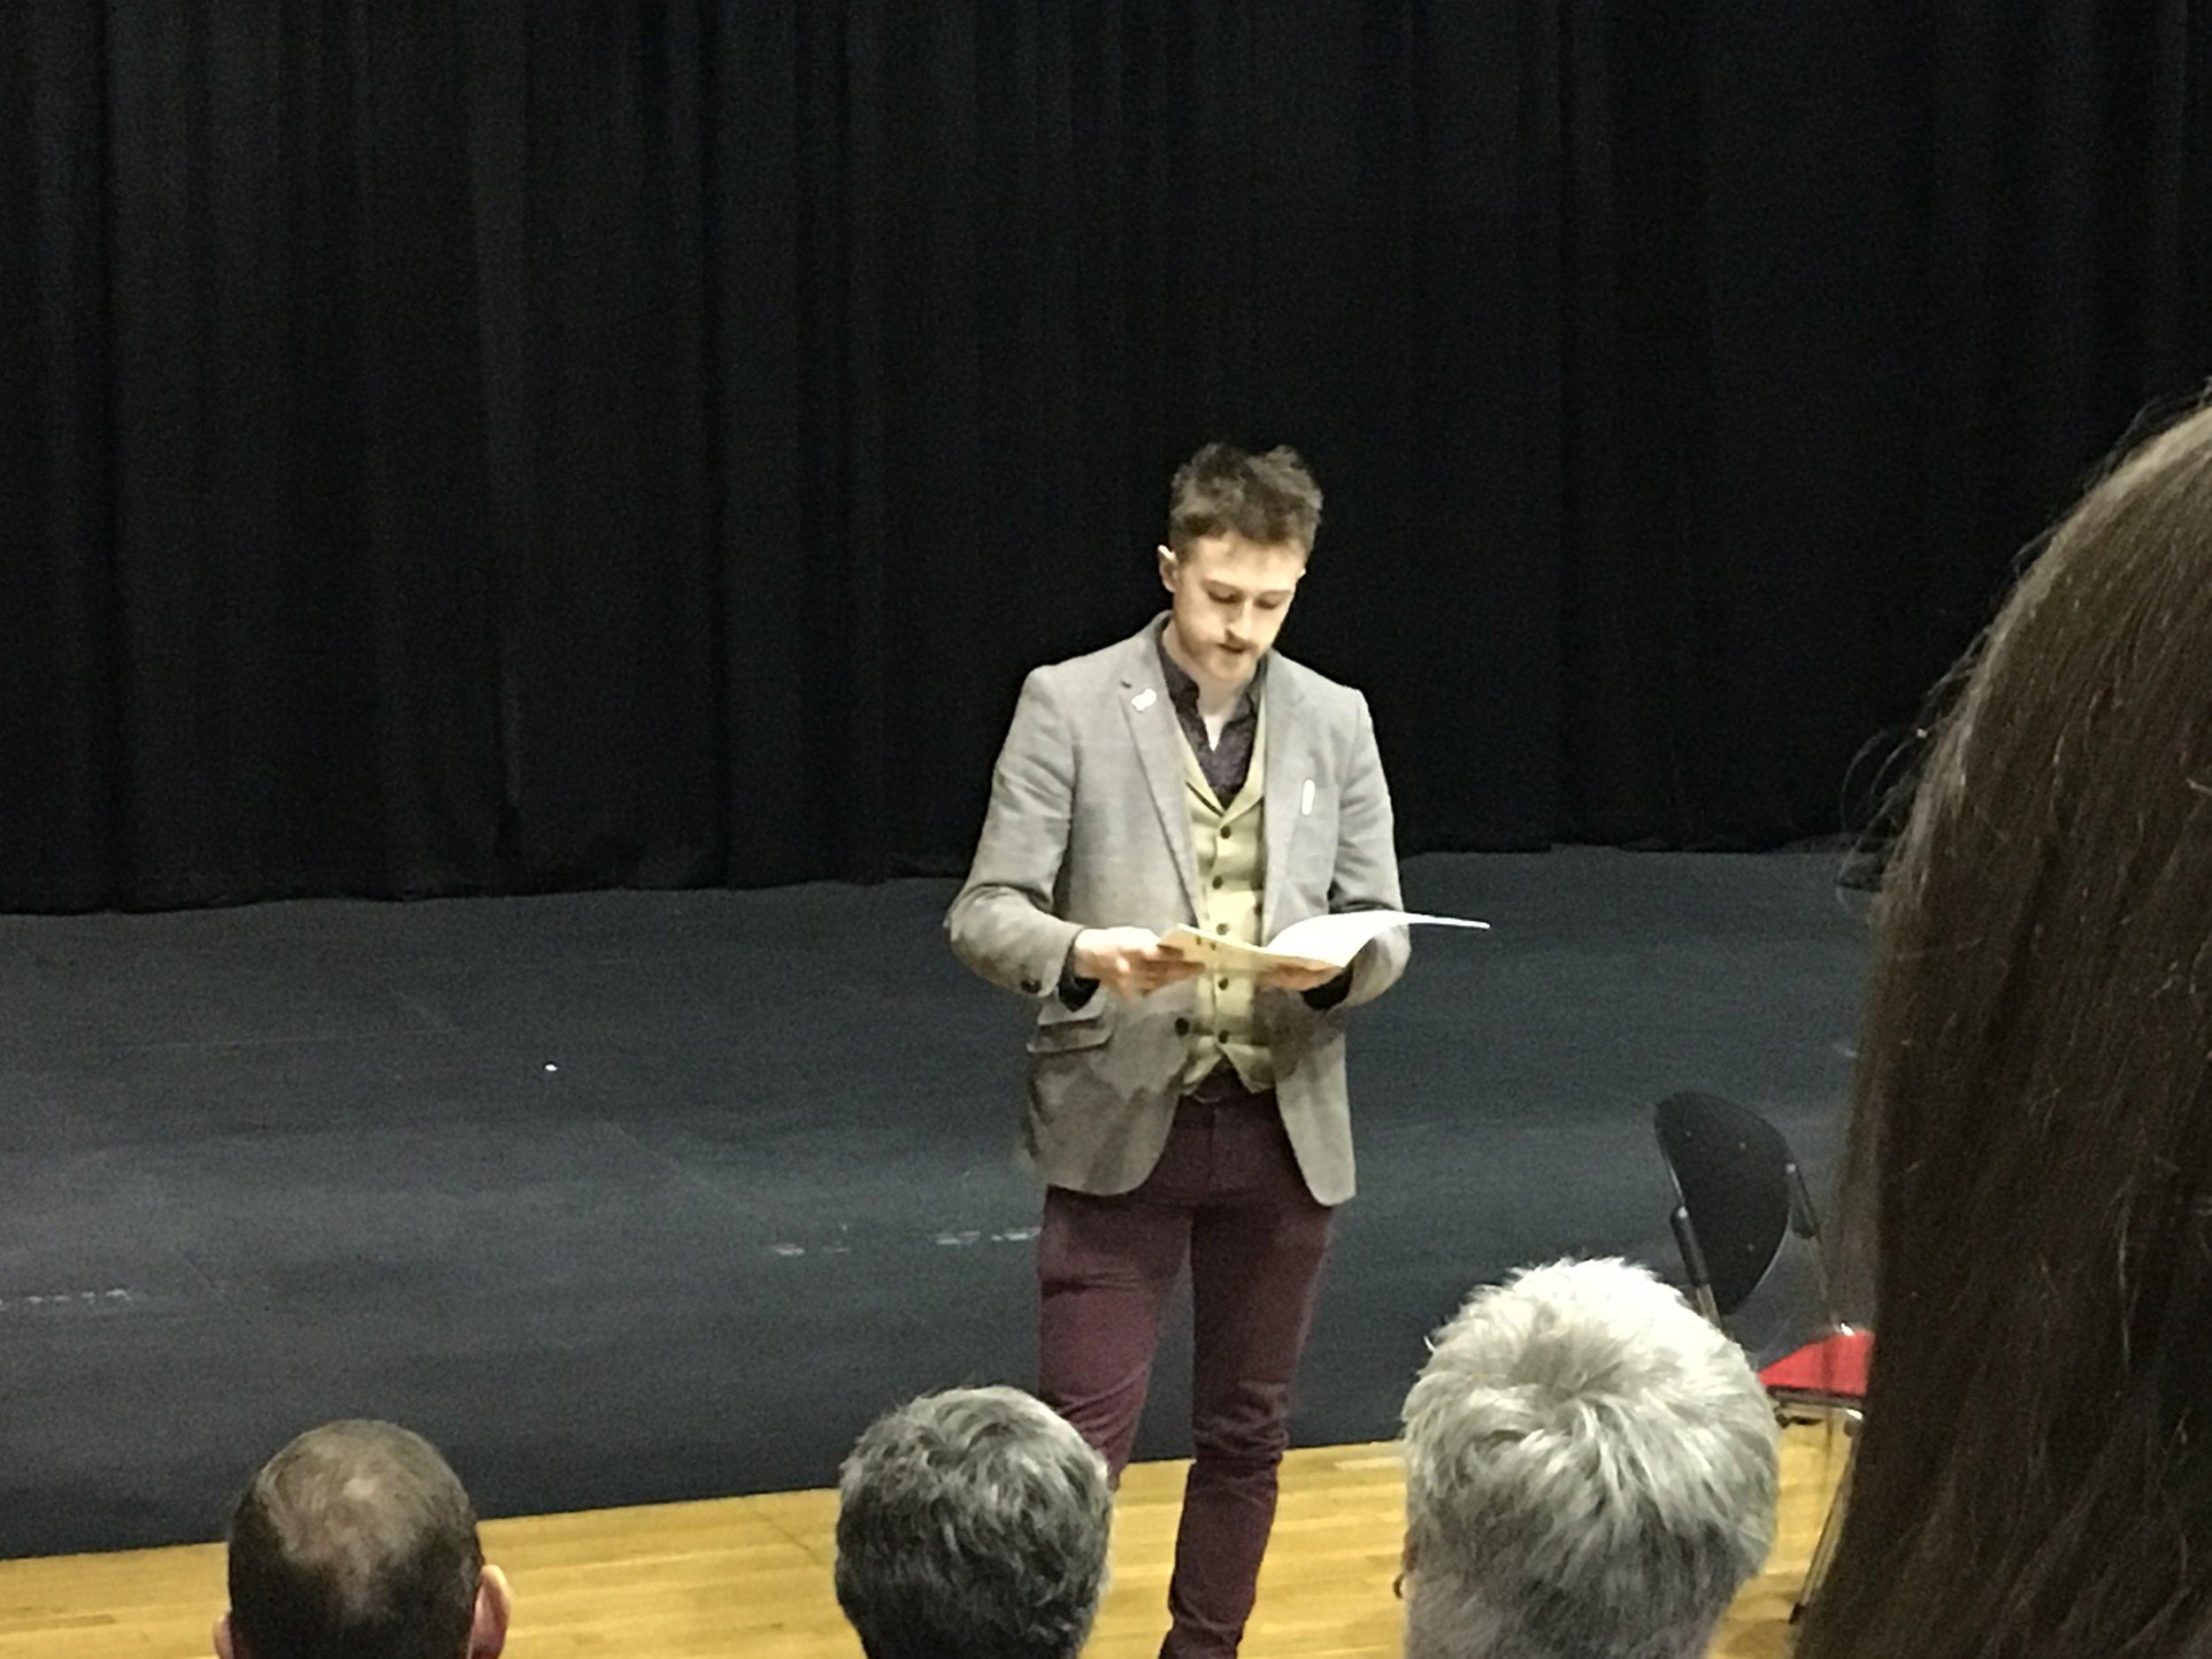 Rupert Ibbotson read his poem, 'Common Line Etiquette', for our audience.